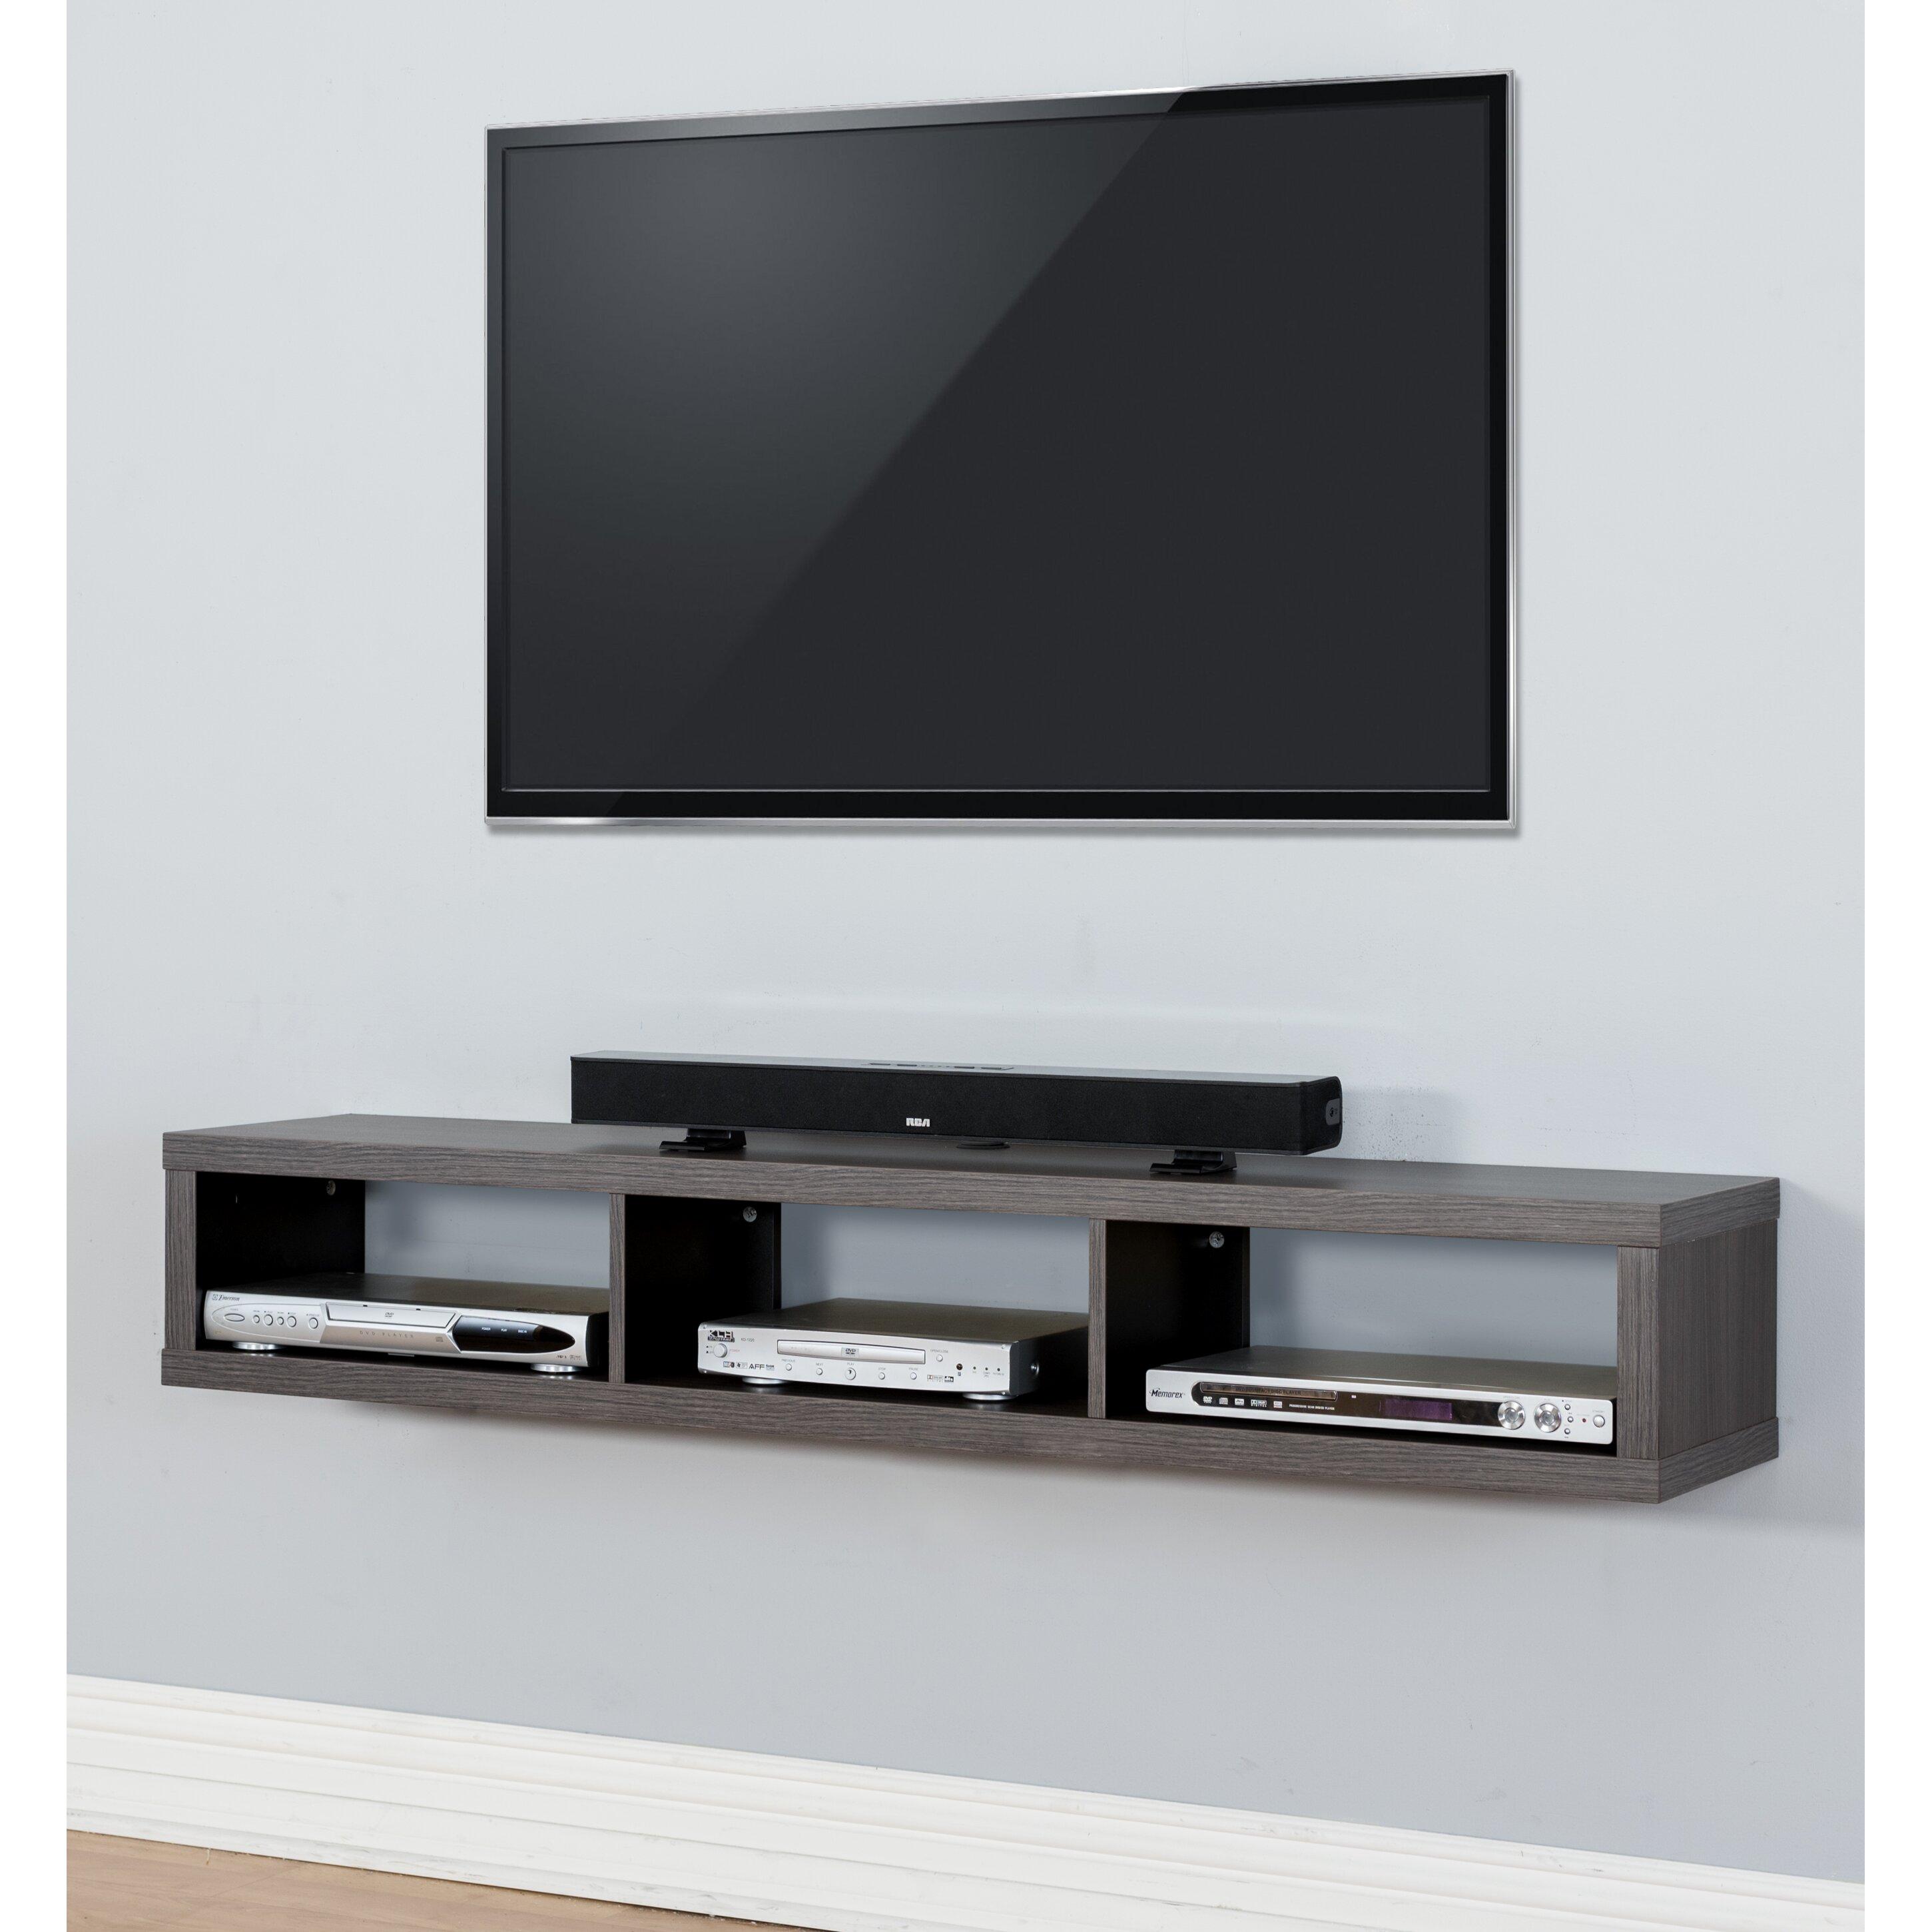 Wall Television Shelves : 60